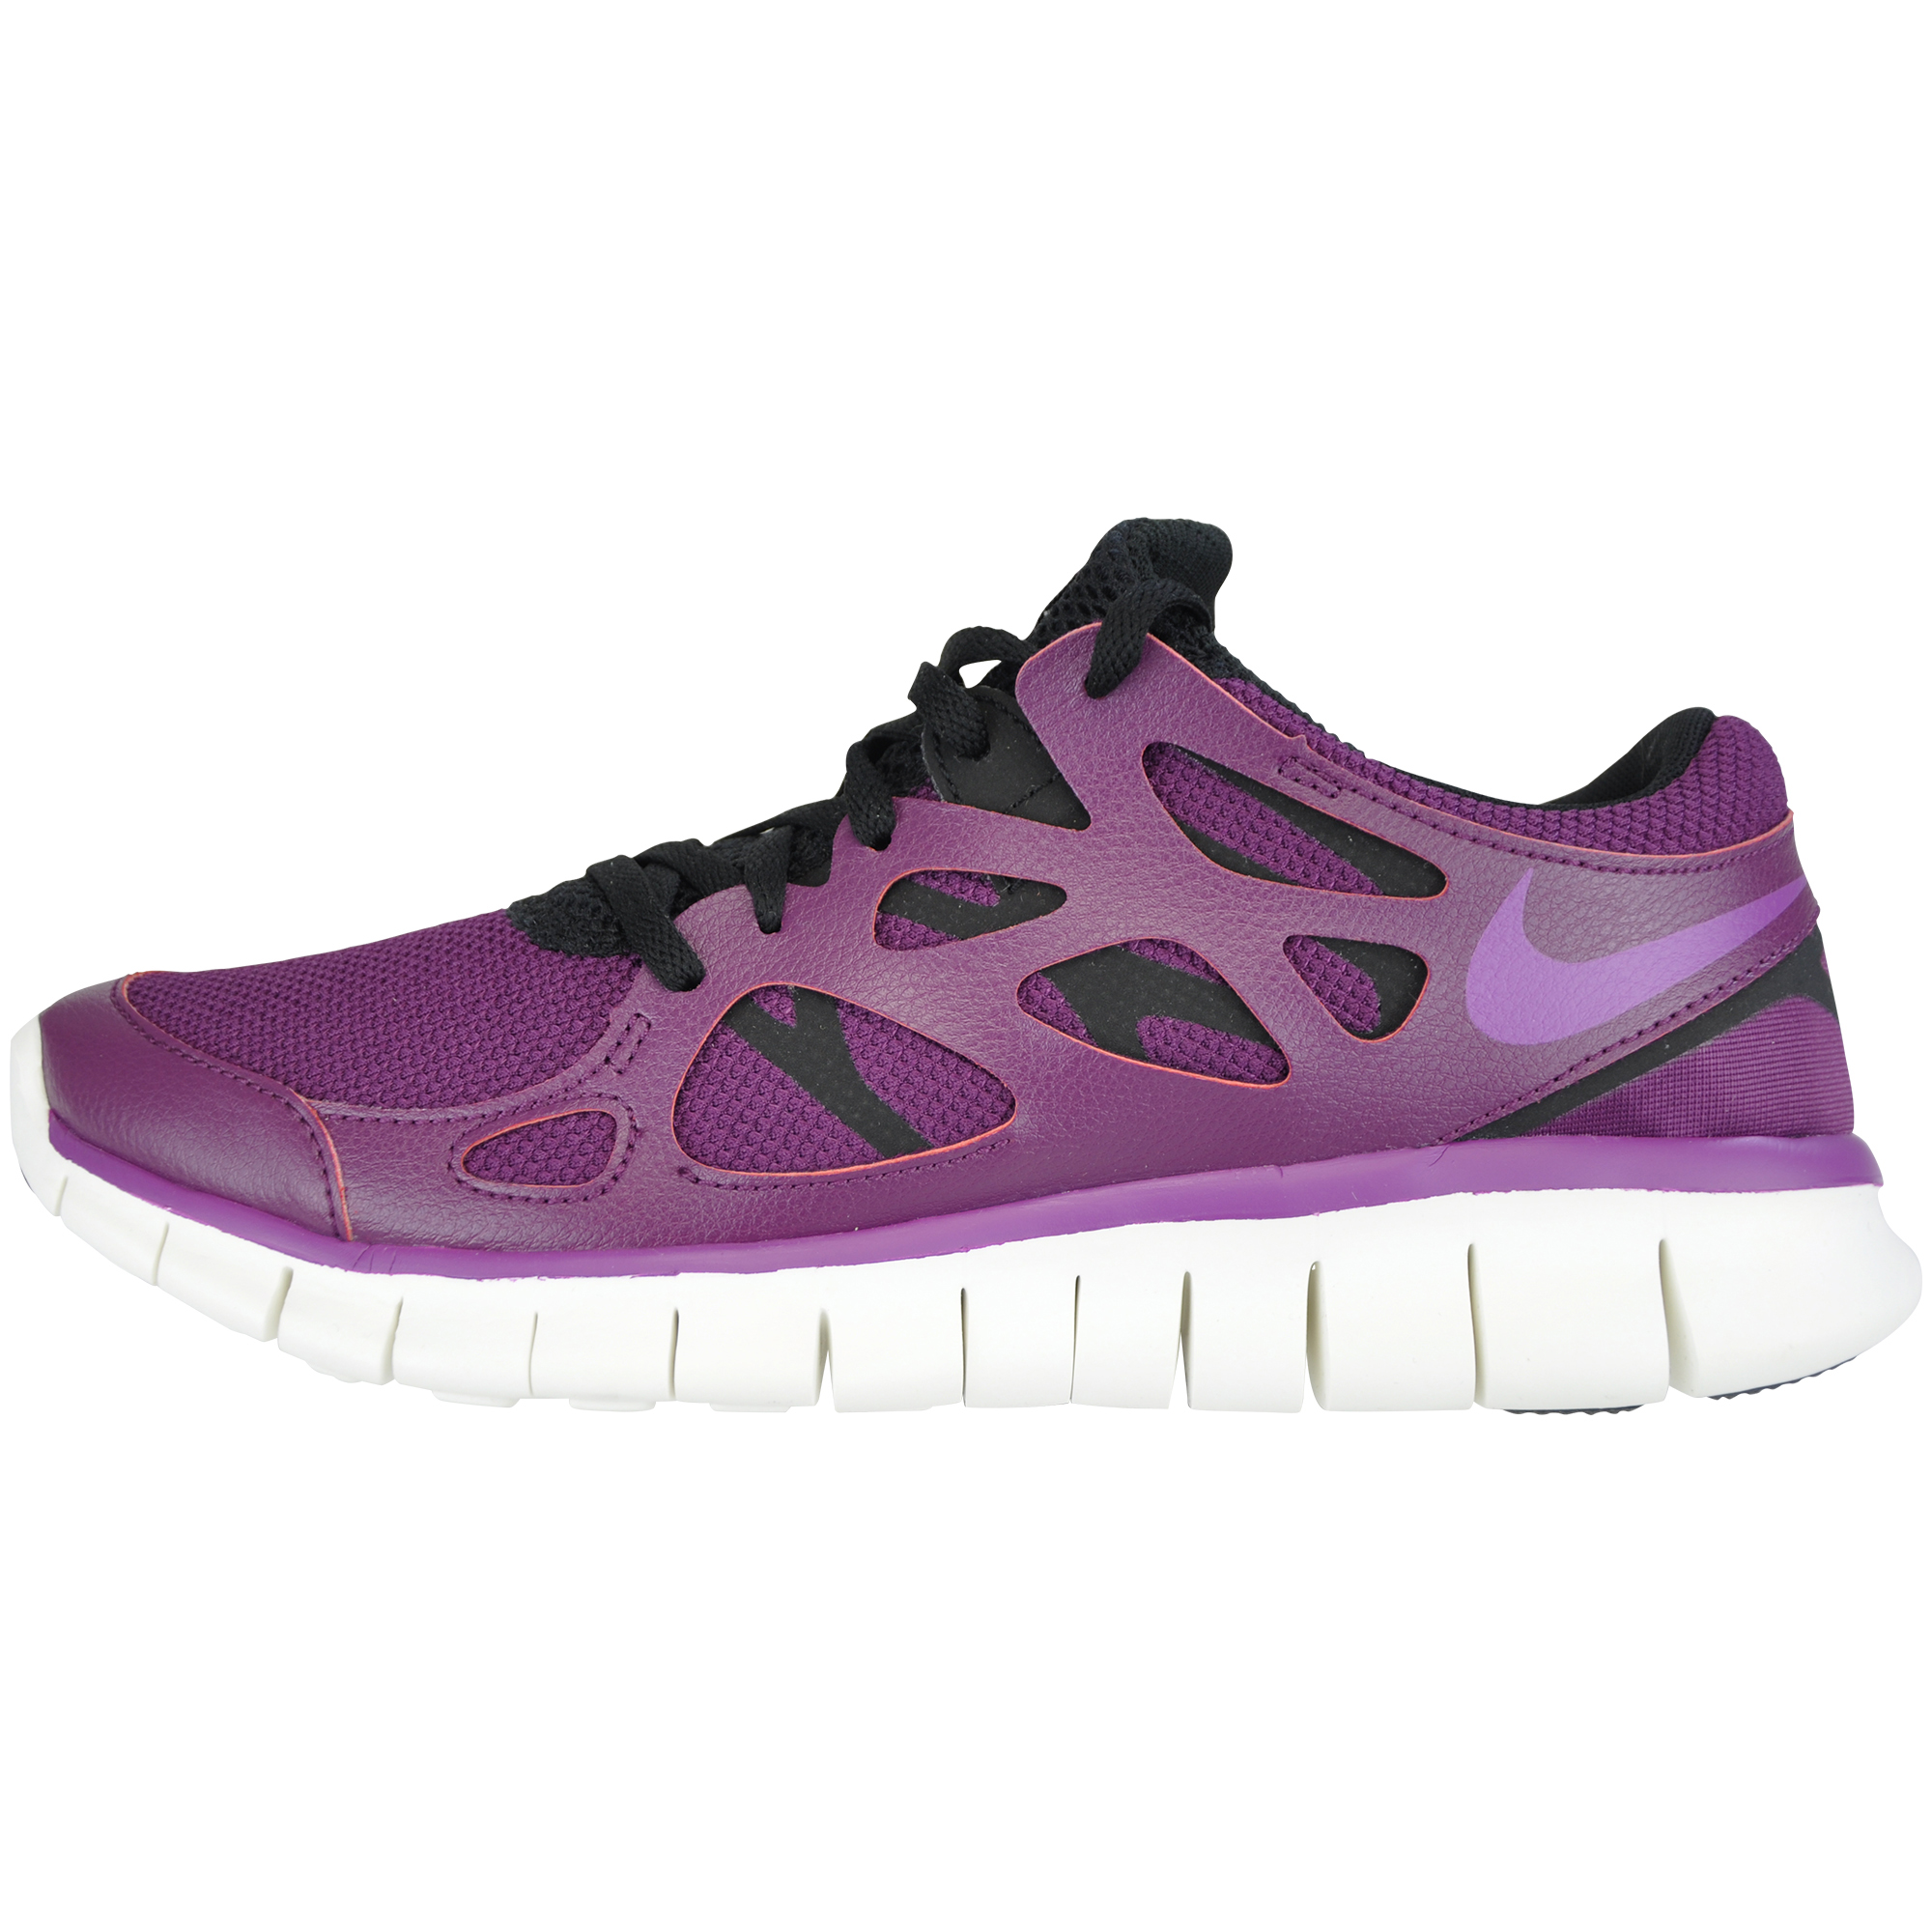 Nike Free Run 2 EXT Rosherun Roshe One Print Air Max Thea Tavas Print One Prem Laufschuhe 55824e